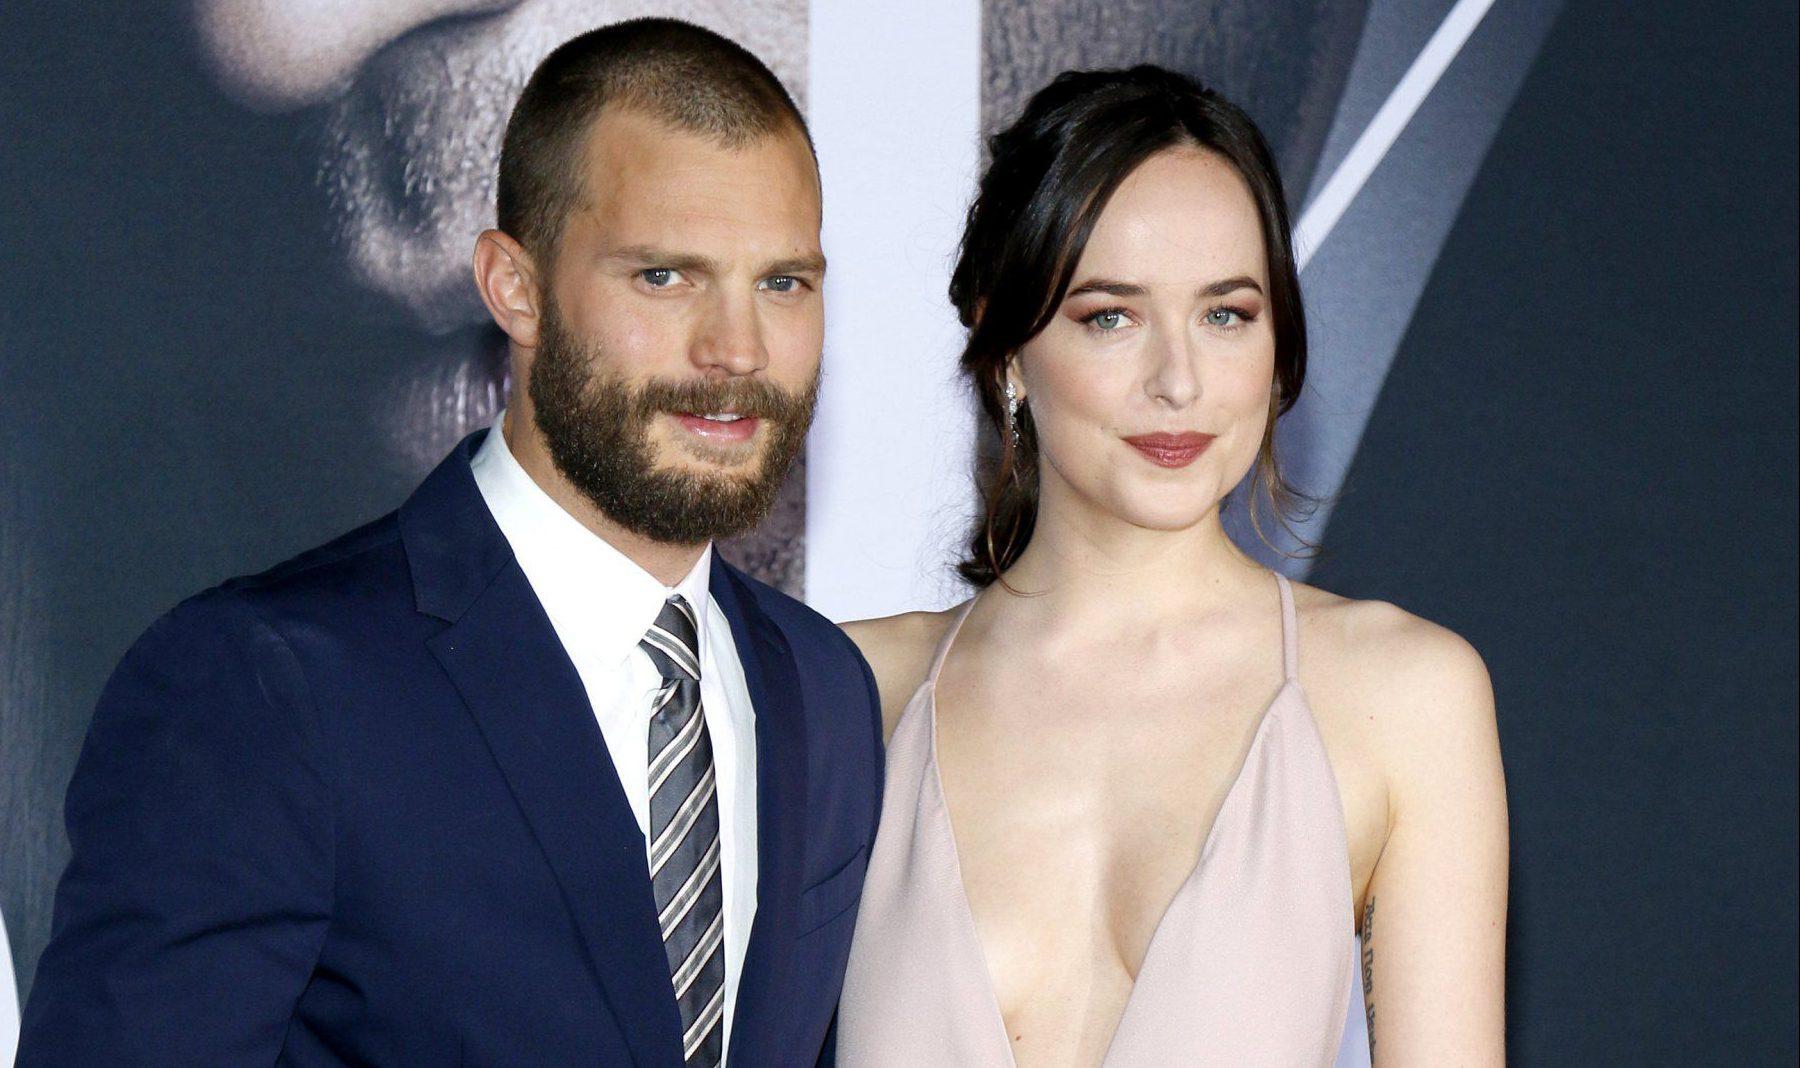 Dakota Johnson describes her Fifty Shades Darker co-star Jamie Dornan as her 'dream partner'